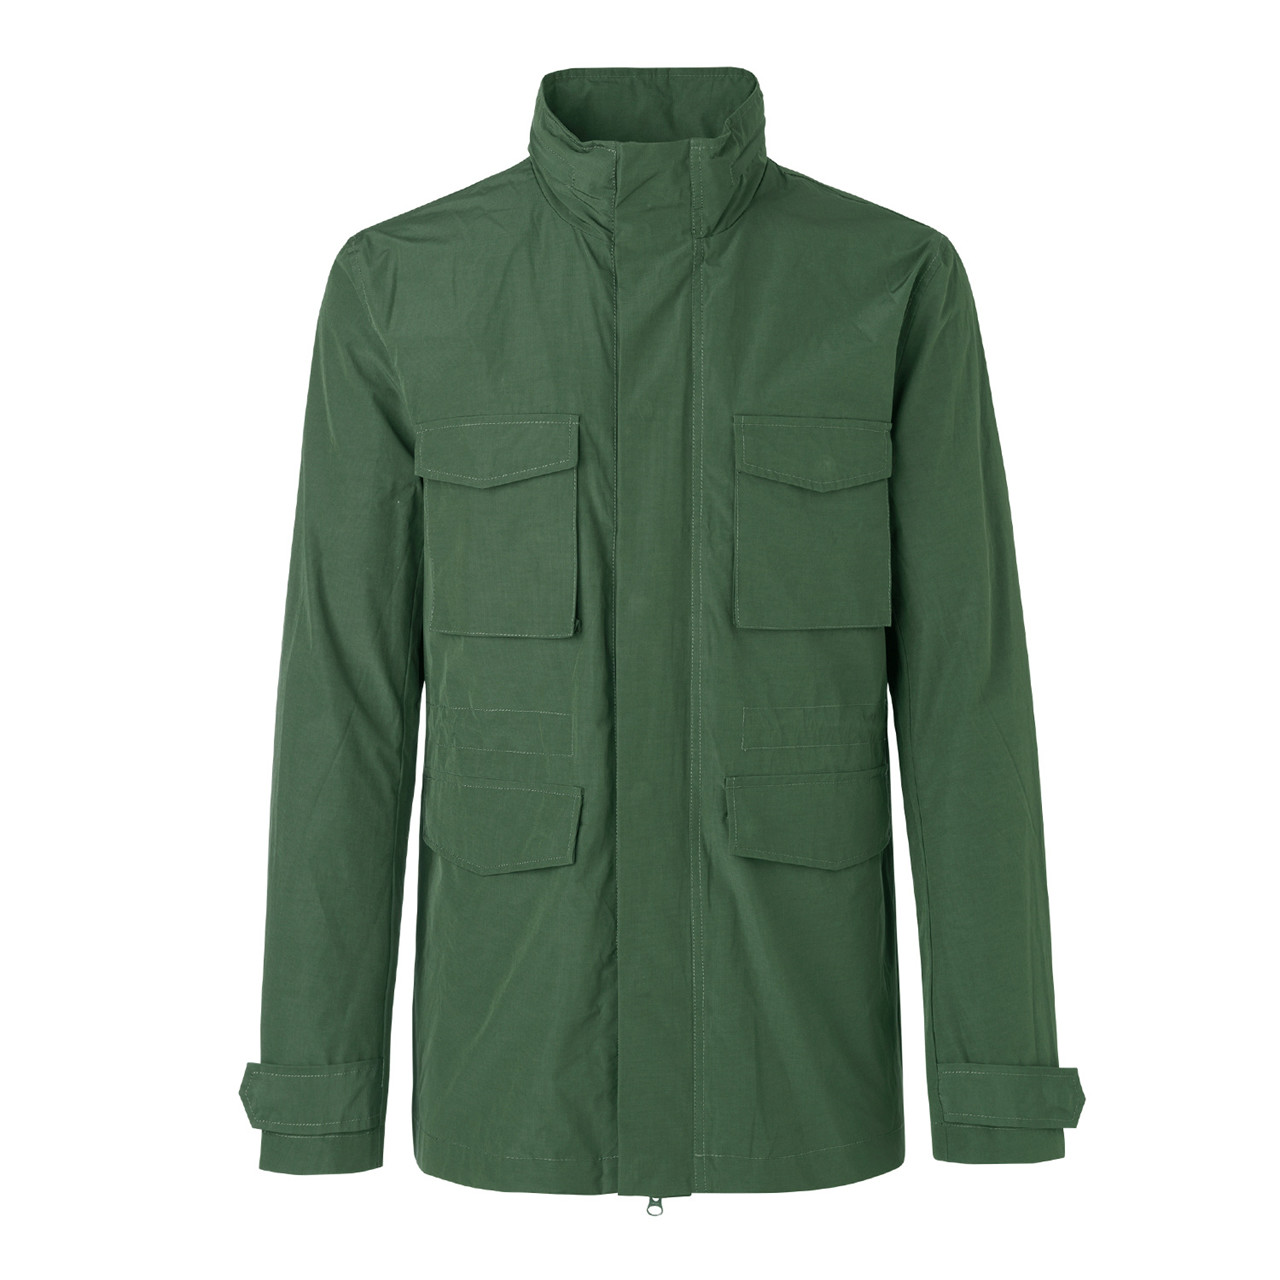 e54db0926a9 Samsøe samsøe grøn jakke